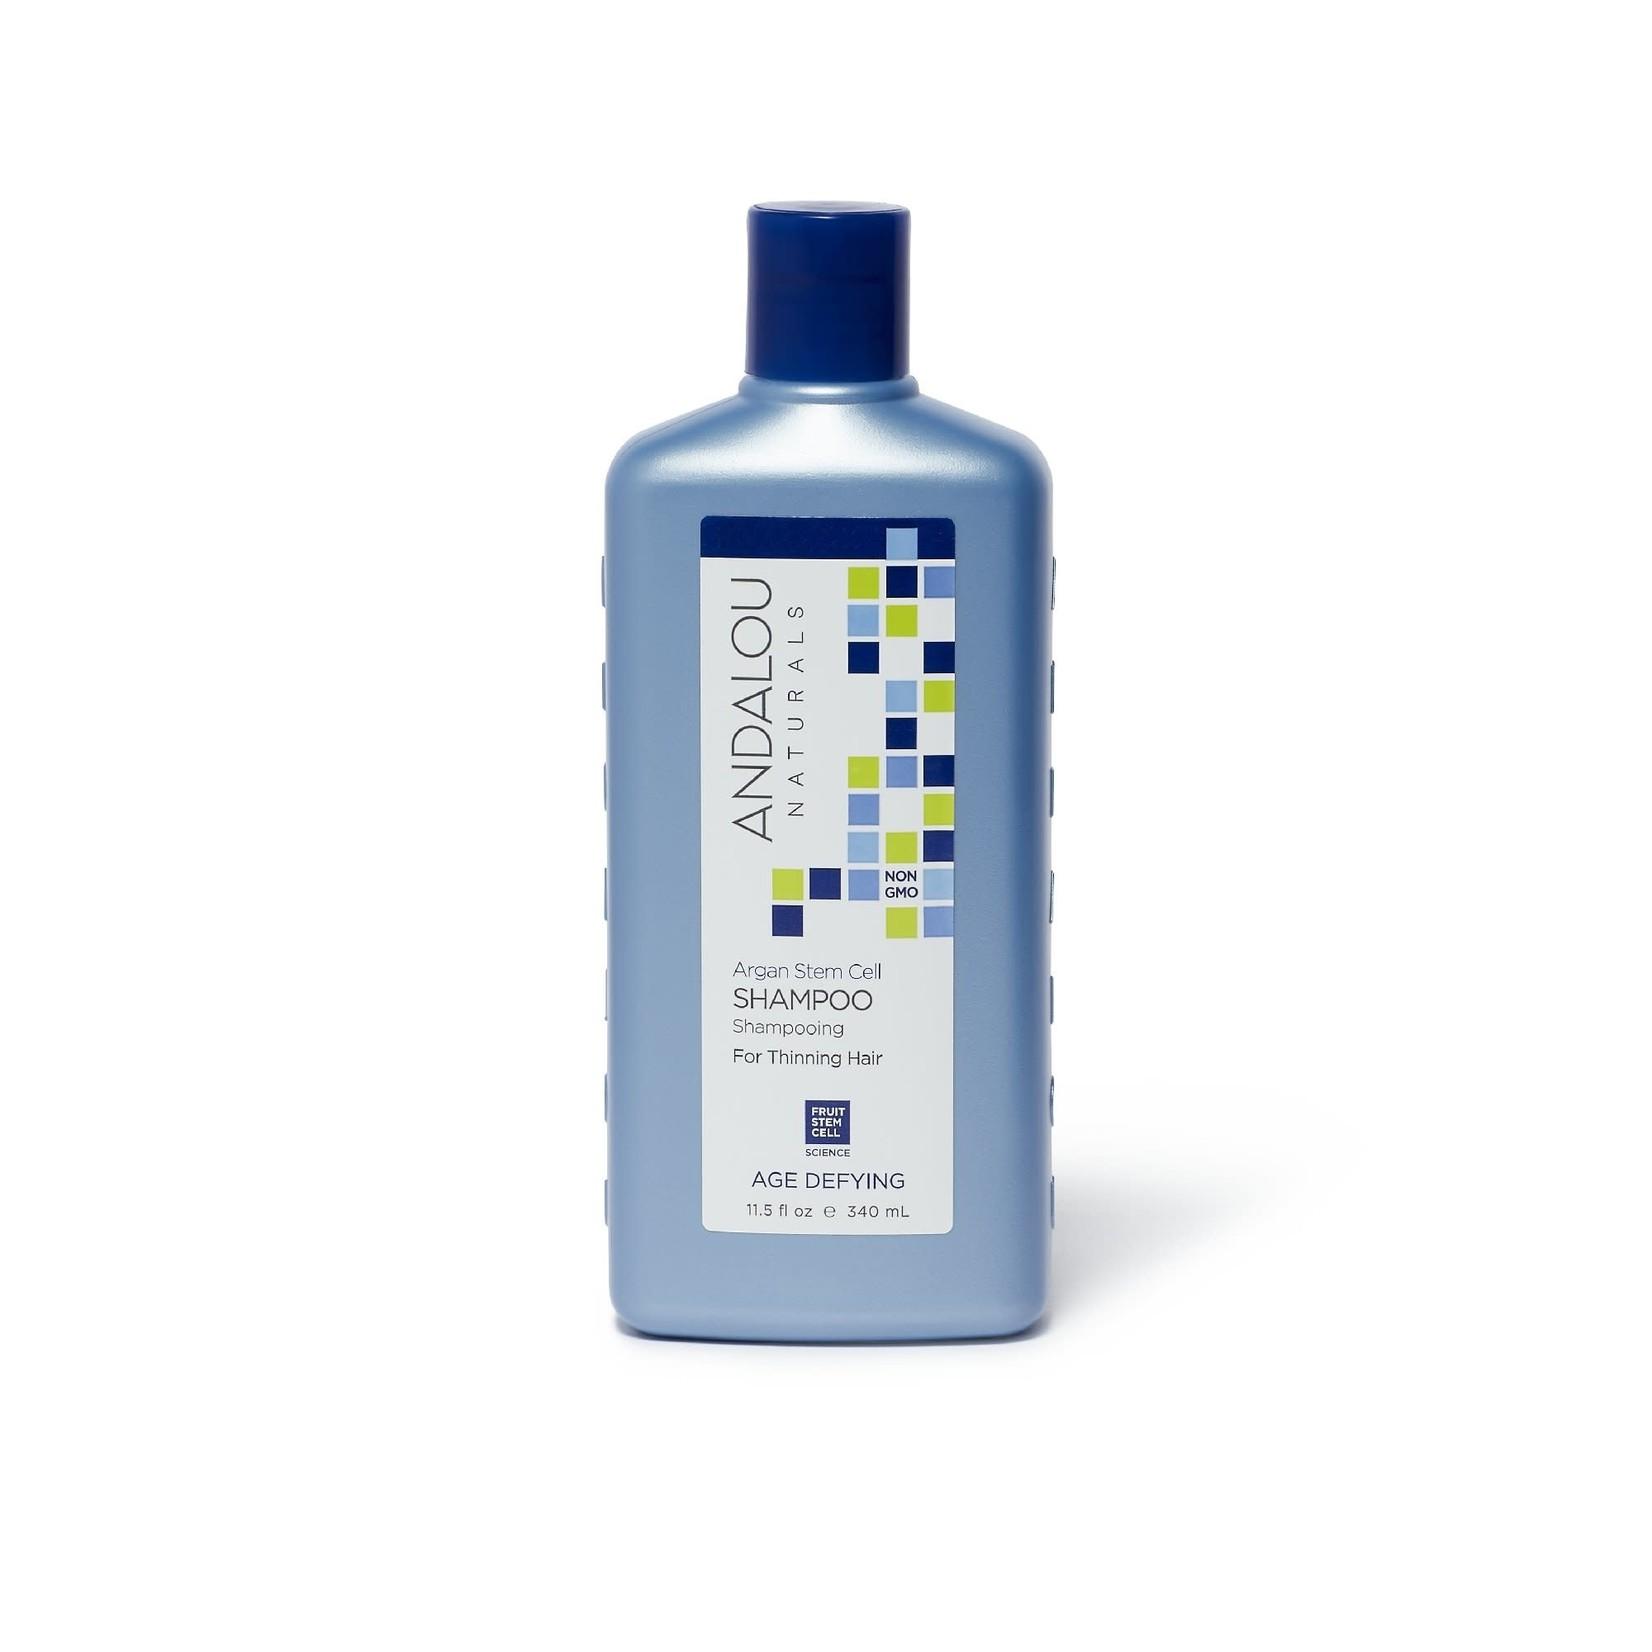 Andalou Andalou Argan Stem Cell Shampoo 340ml